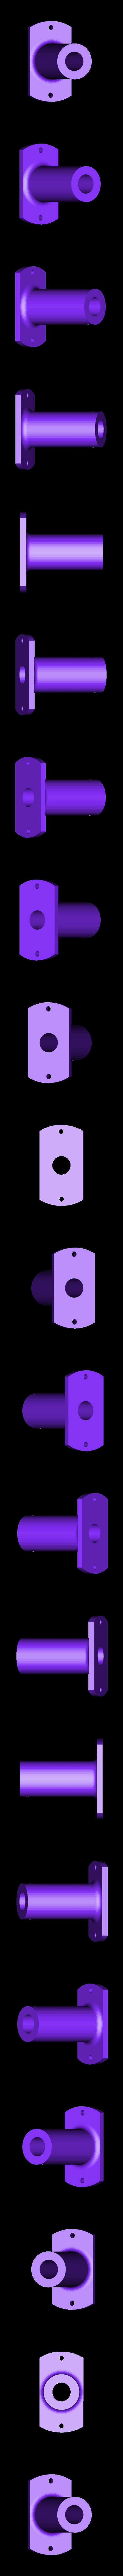 LP-Front-Stop101.stl Download free STL file Jet Engine, 3-Spool • 3D printable object, konchan77